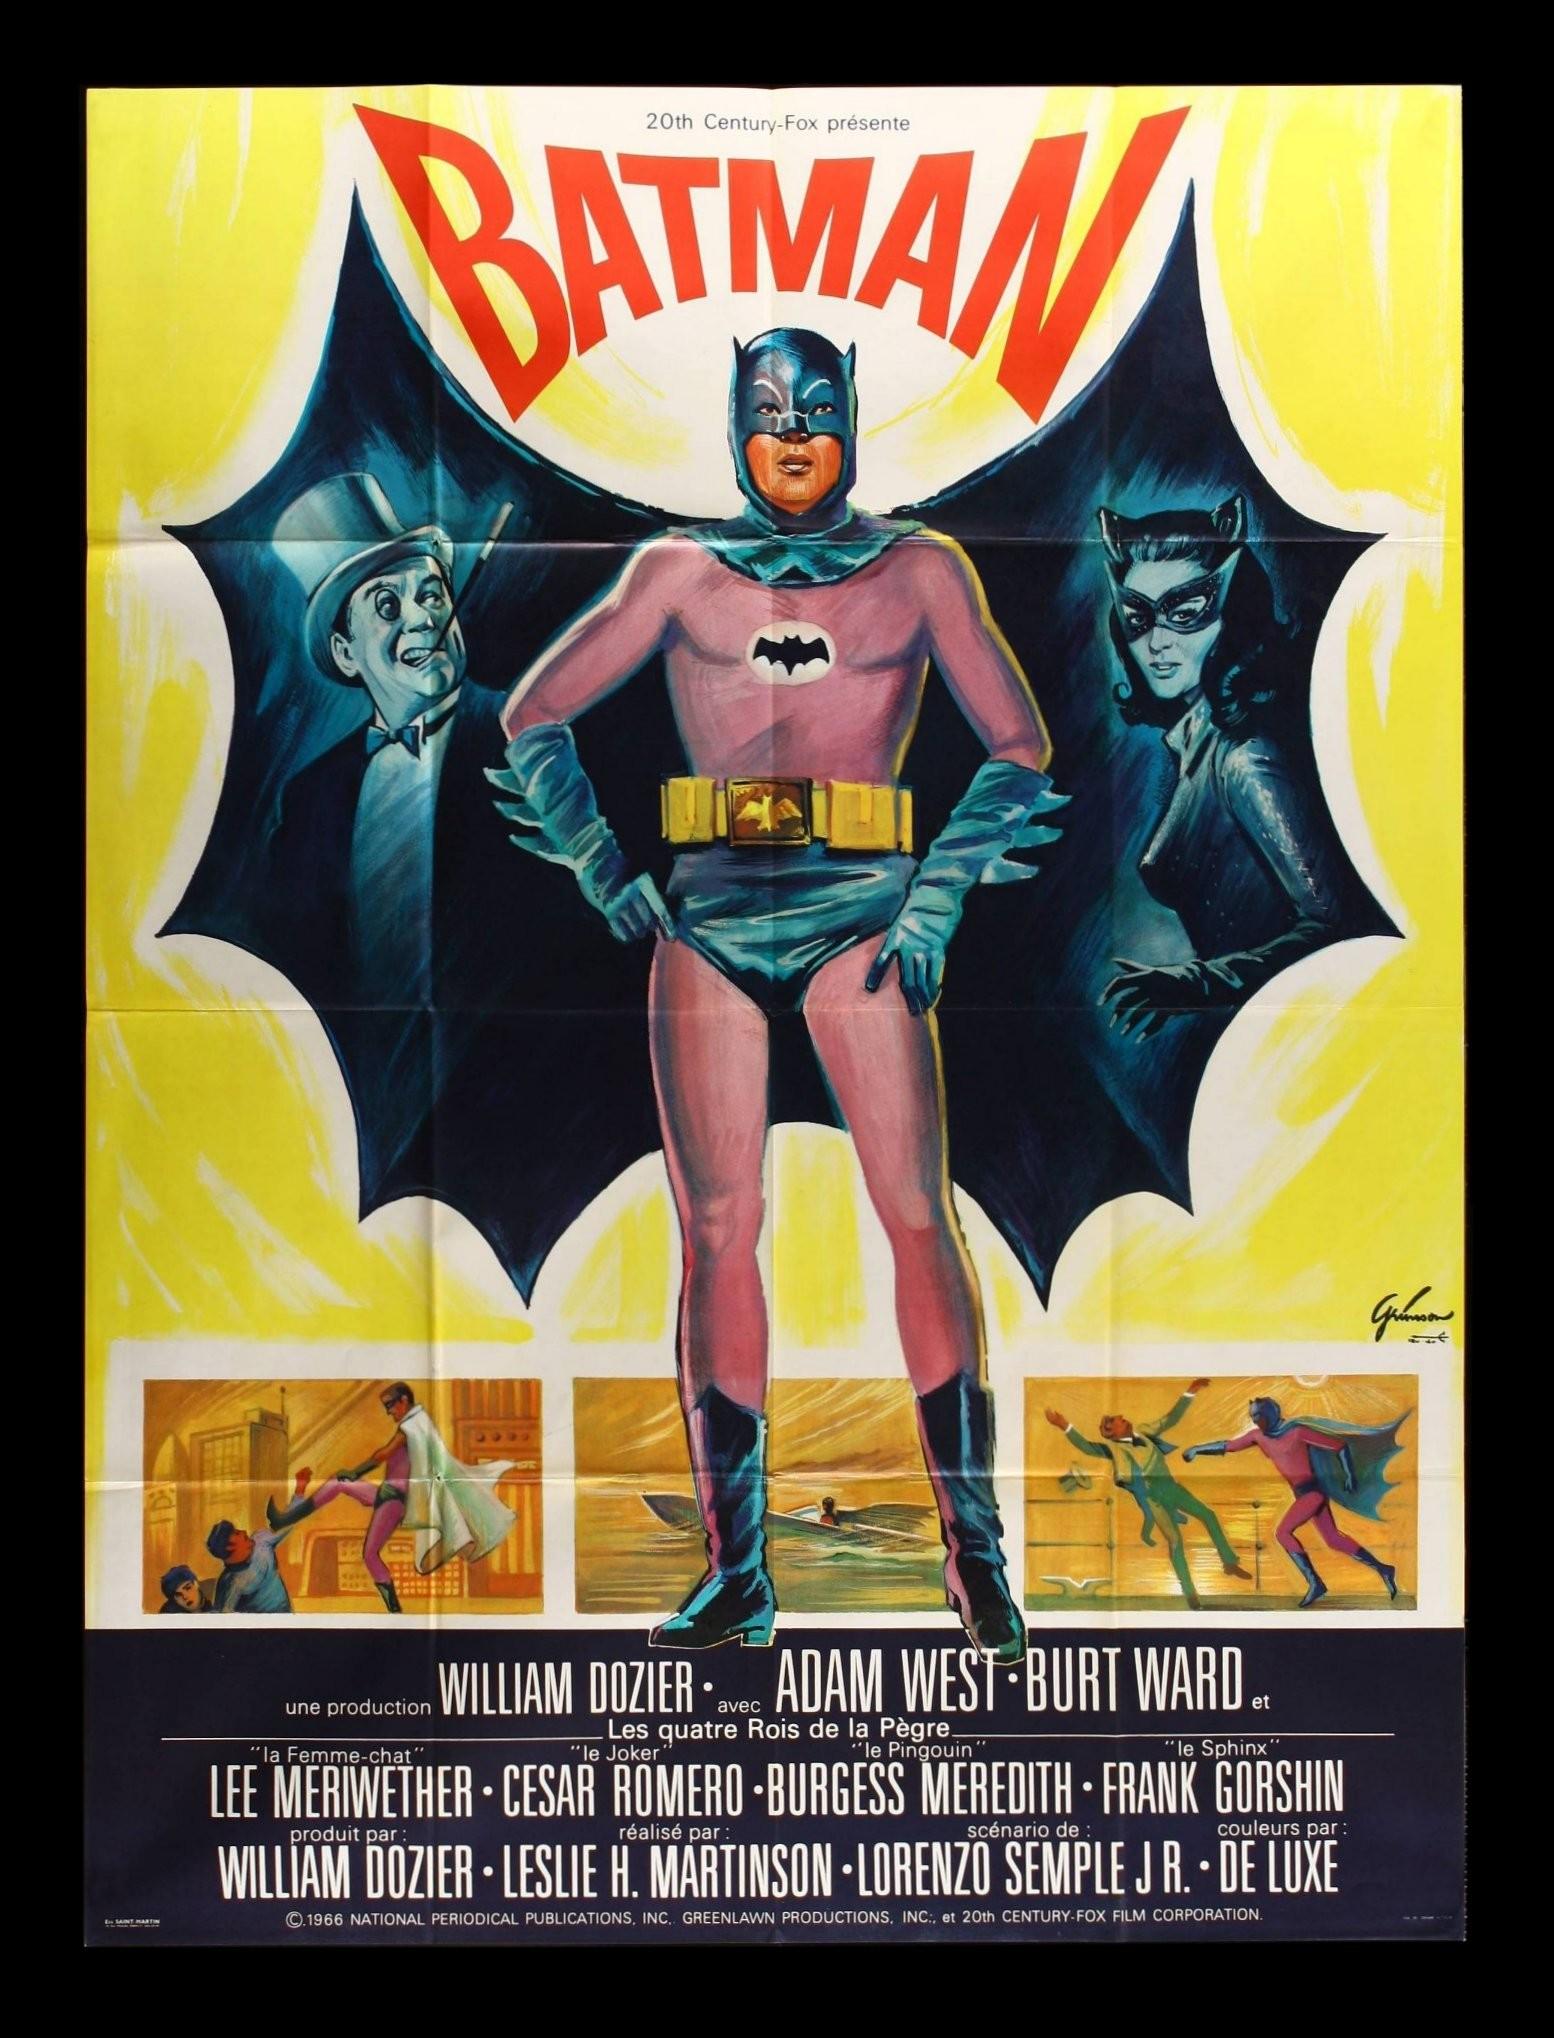 Early Batman Movie Poster Wallpaper